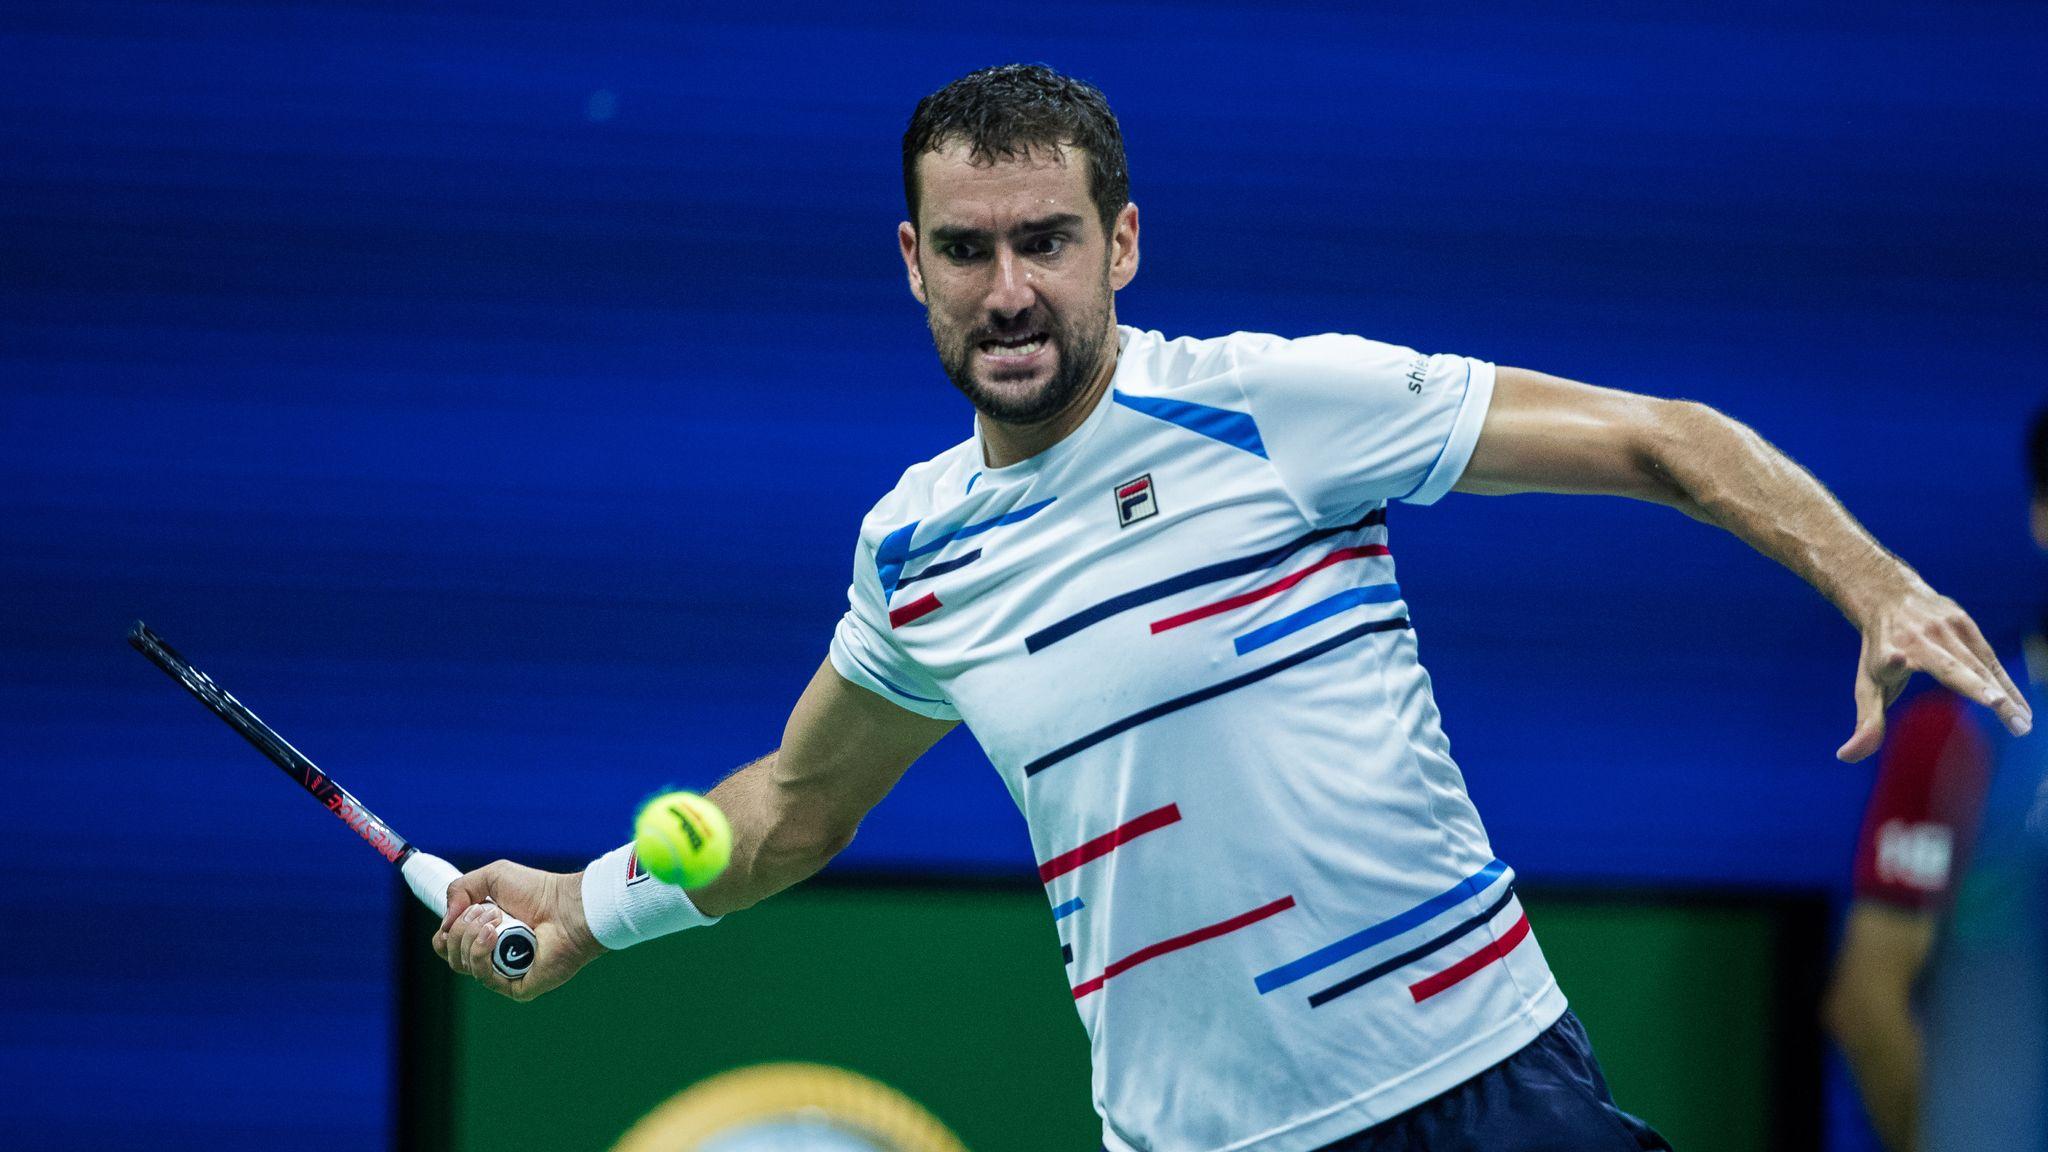 Toronto Open 2021: Marin Cilic vs. Albert Ramos Vinolas Tennis Pick and Prediction